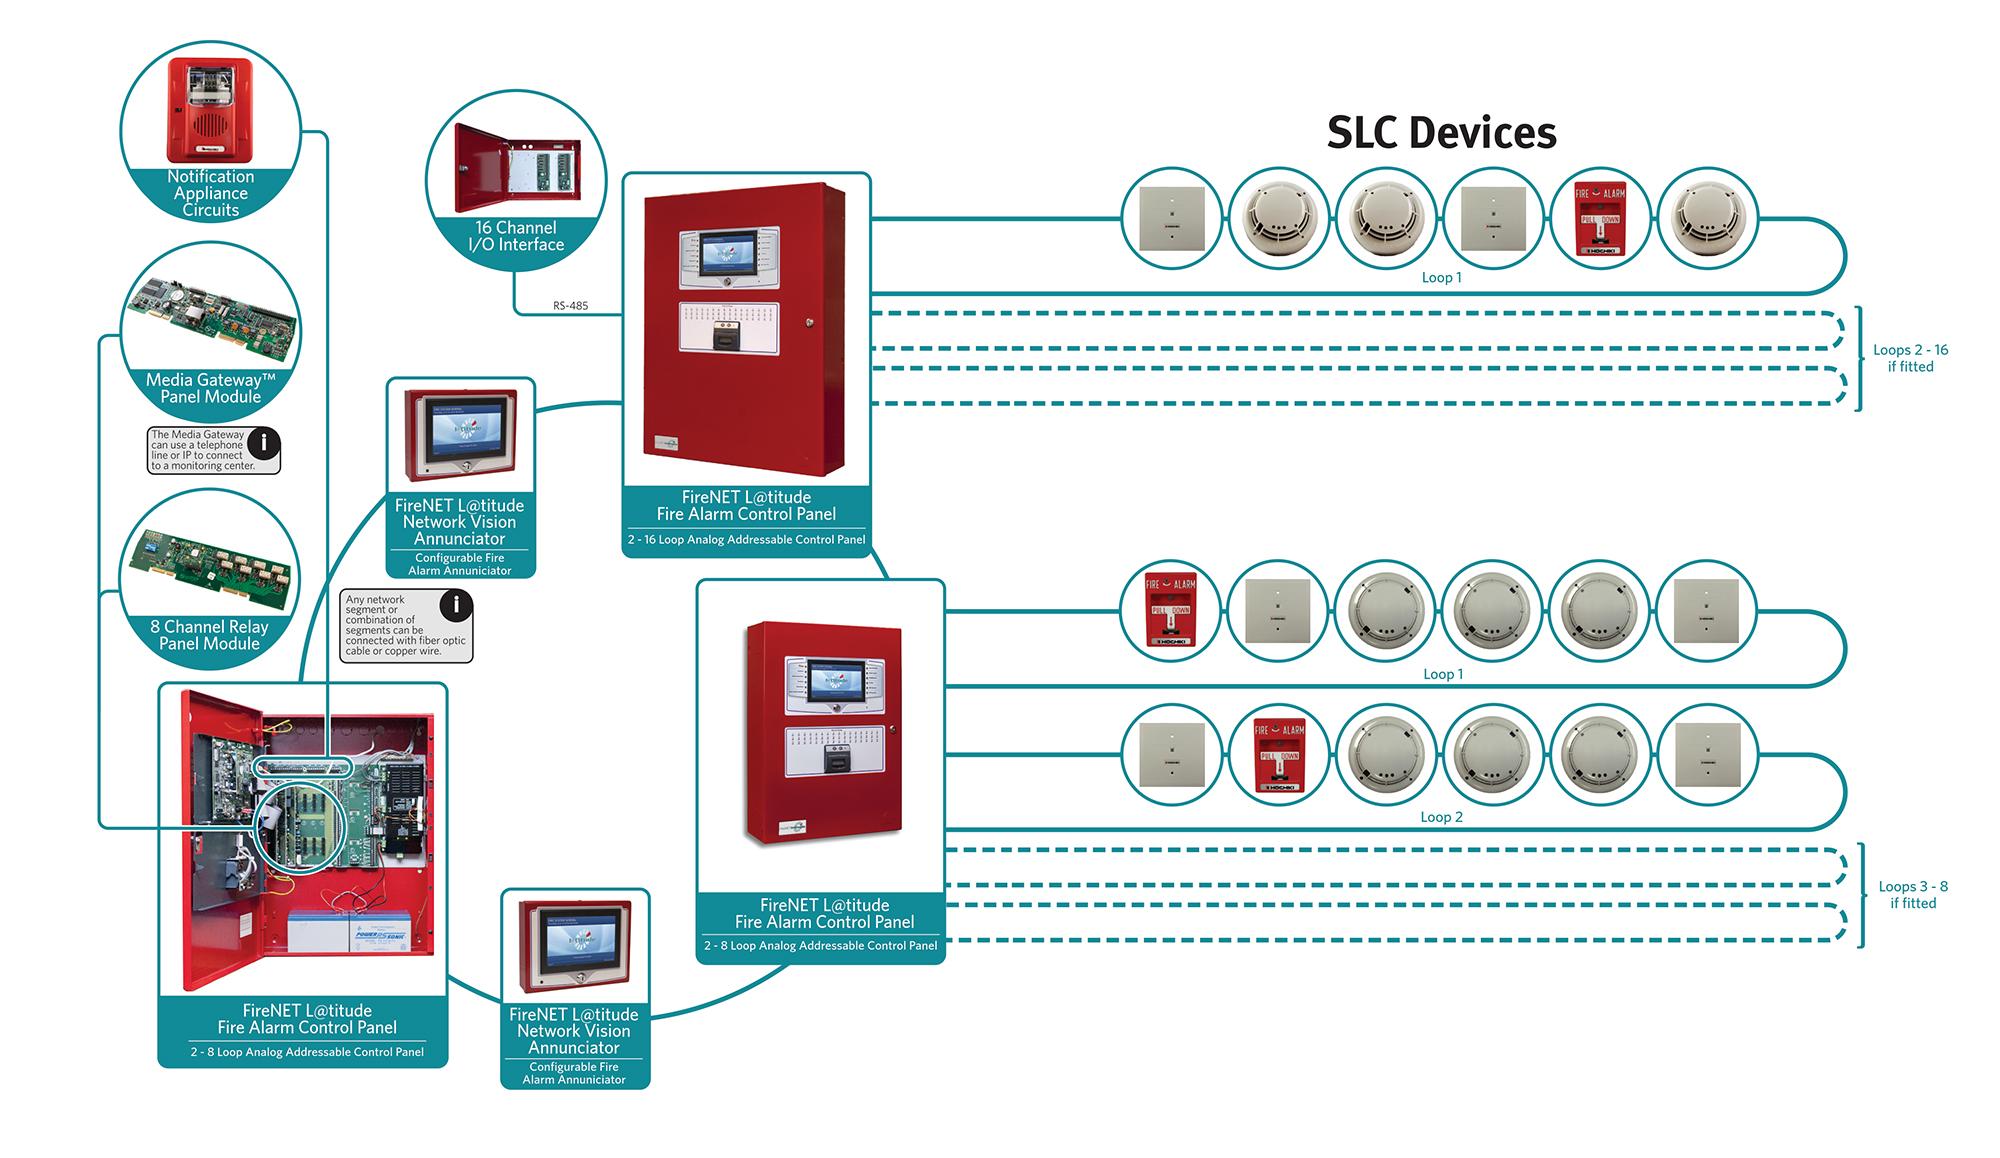 SLC Network